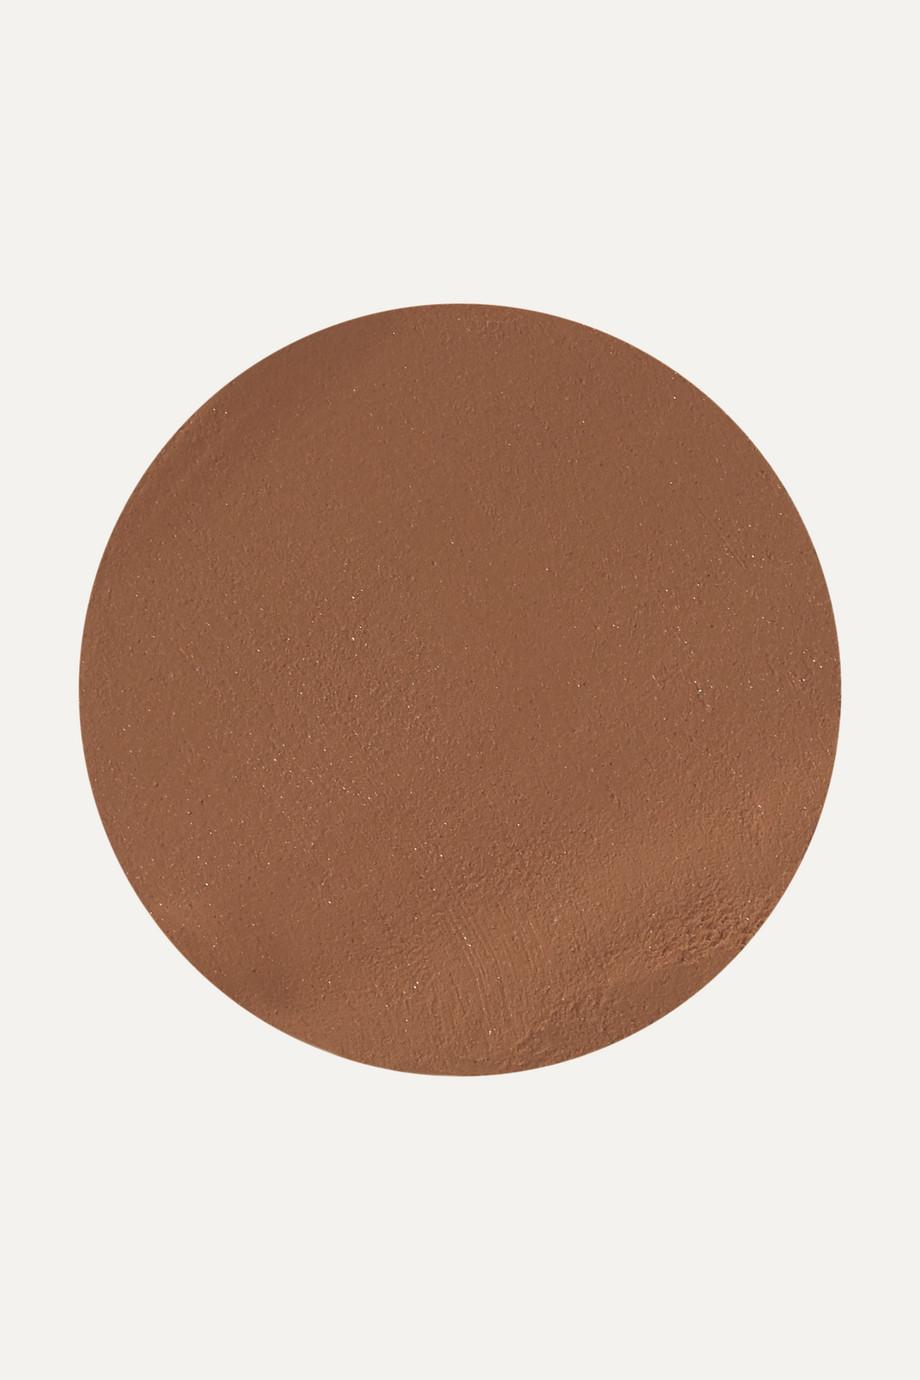 Burberry Beauty Fresh Glow Gel Stick - Deep Brown No.66